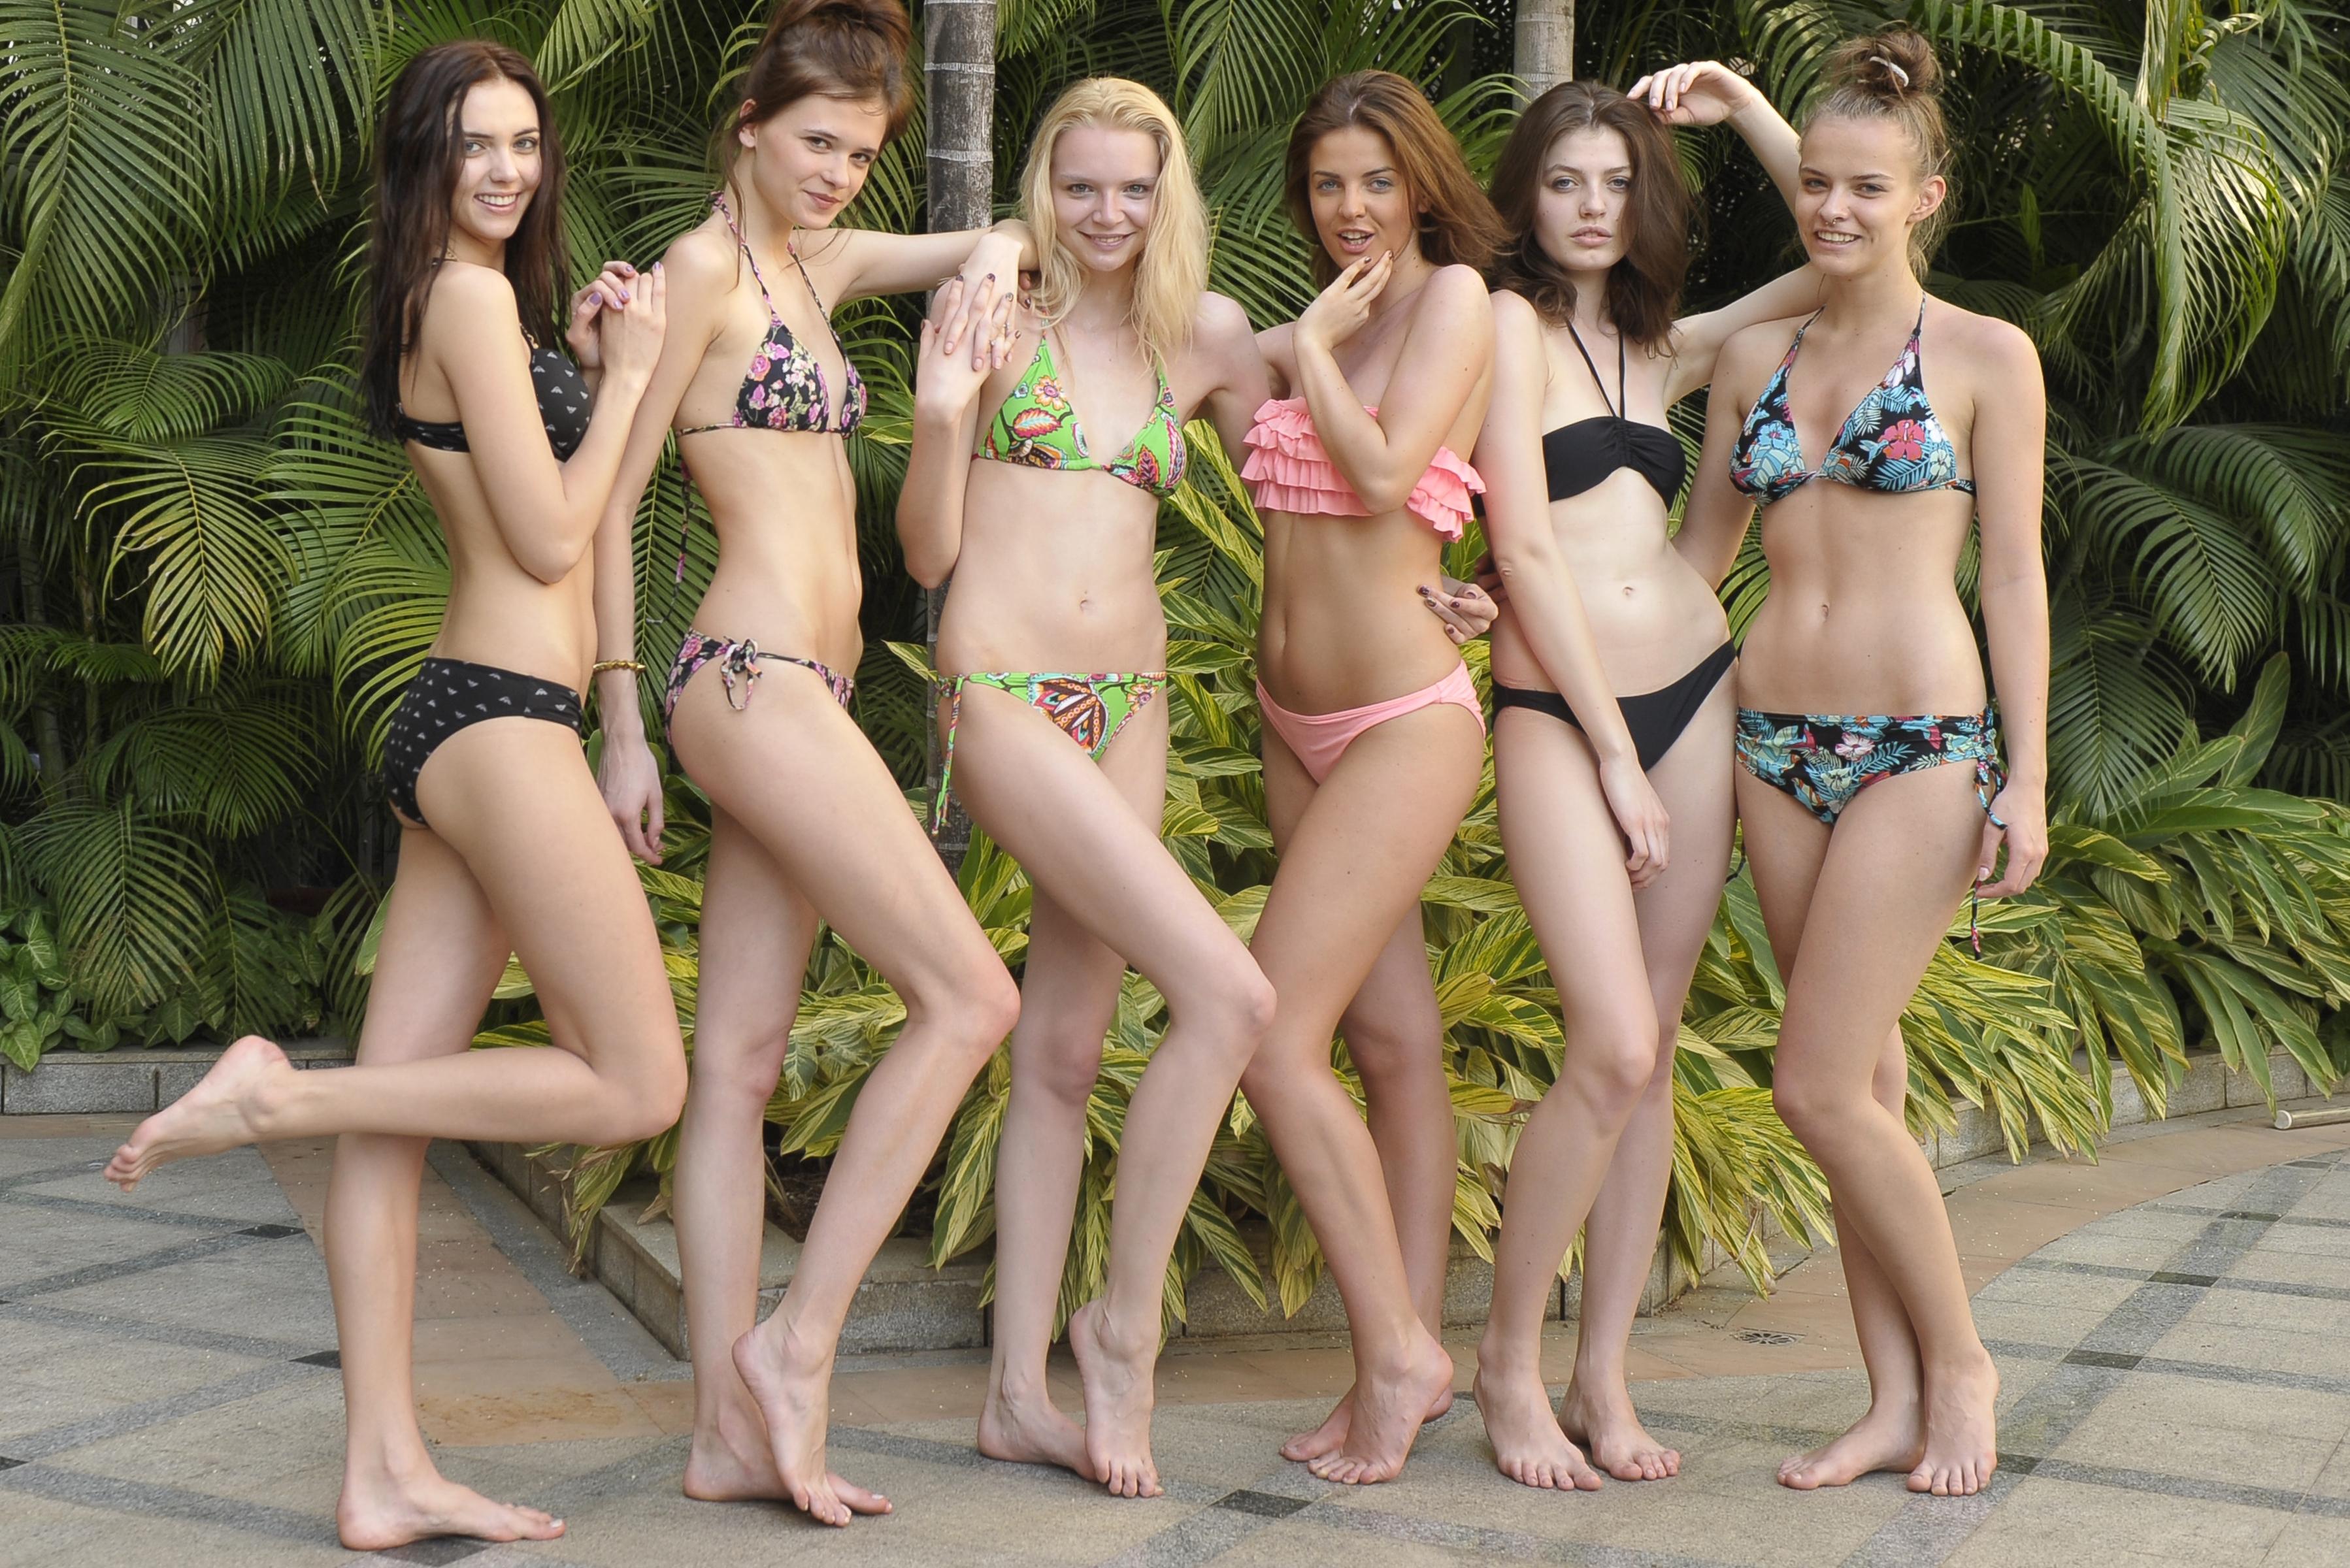 Fappening Bikini Justyna Pawlicka naked photo 2017